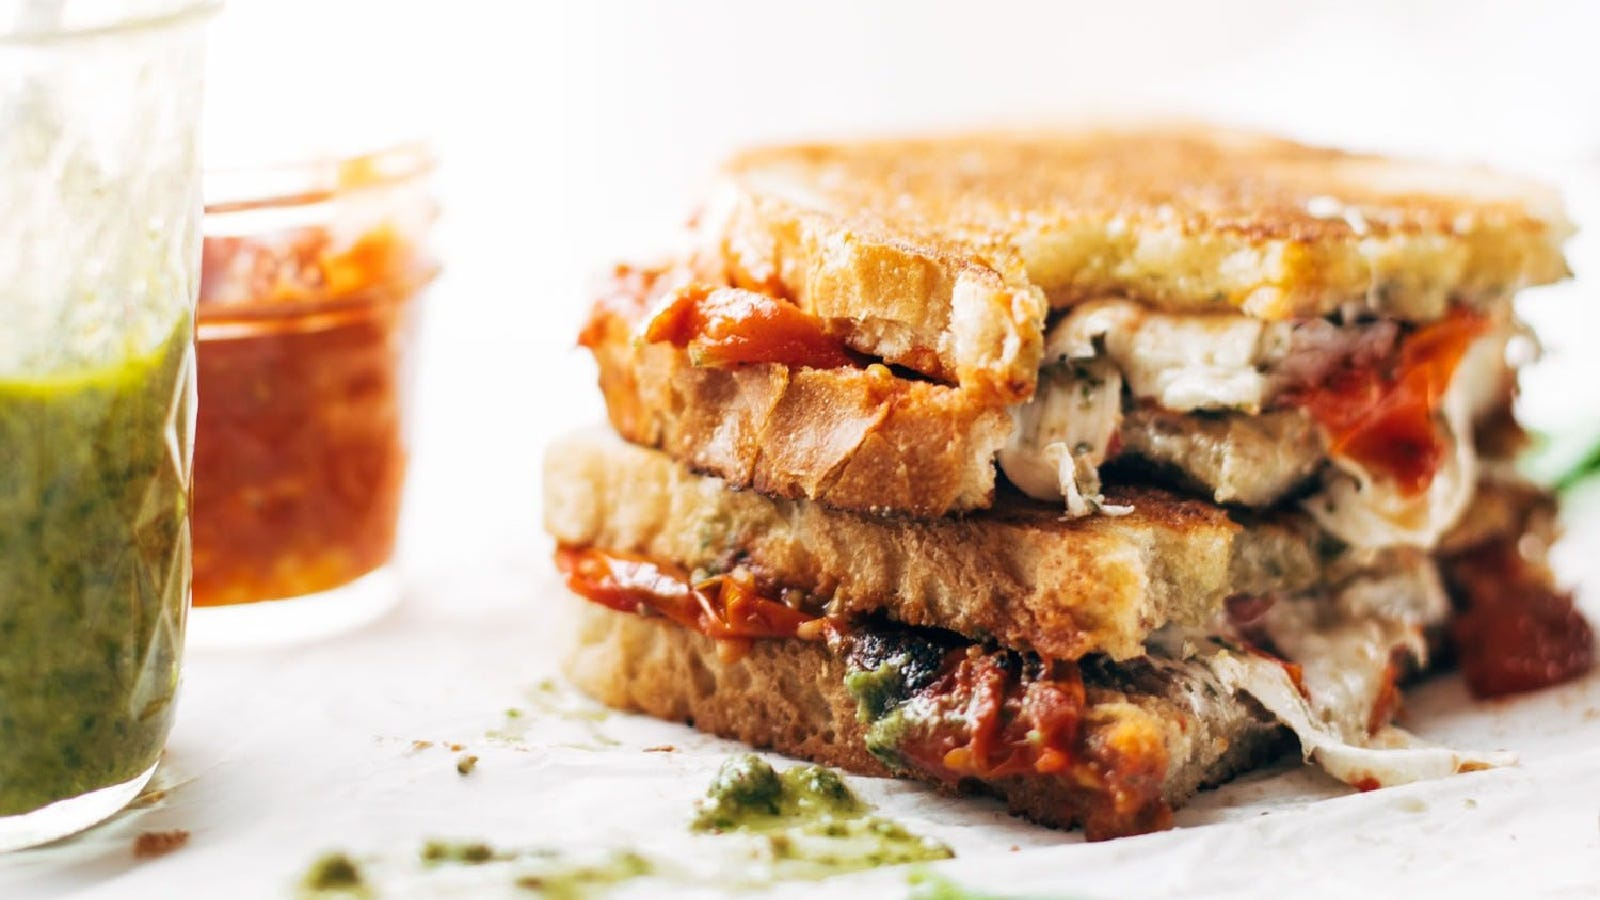 A stacked sandwich, filled with fresh mozzarella, pesto, and tomato garlic sauce.